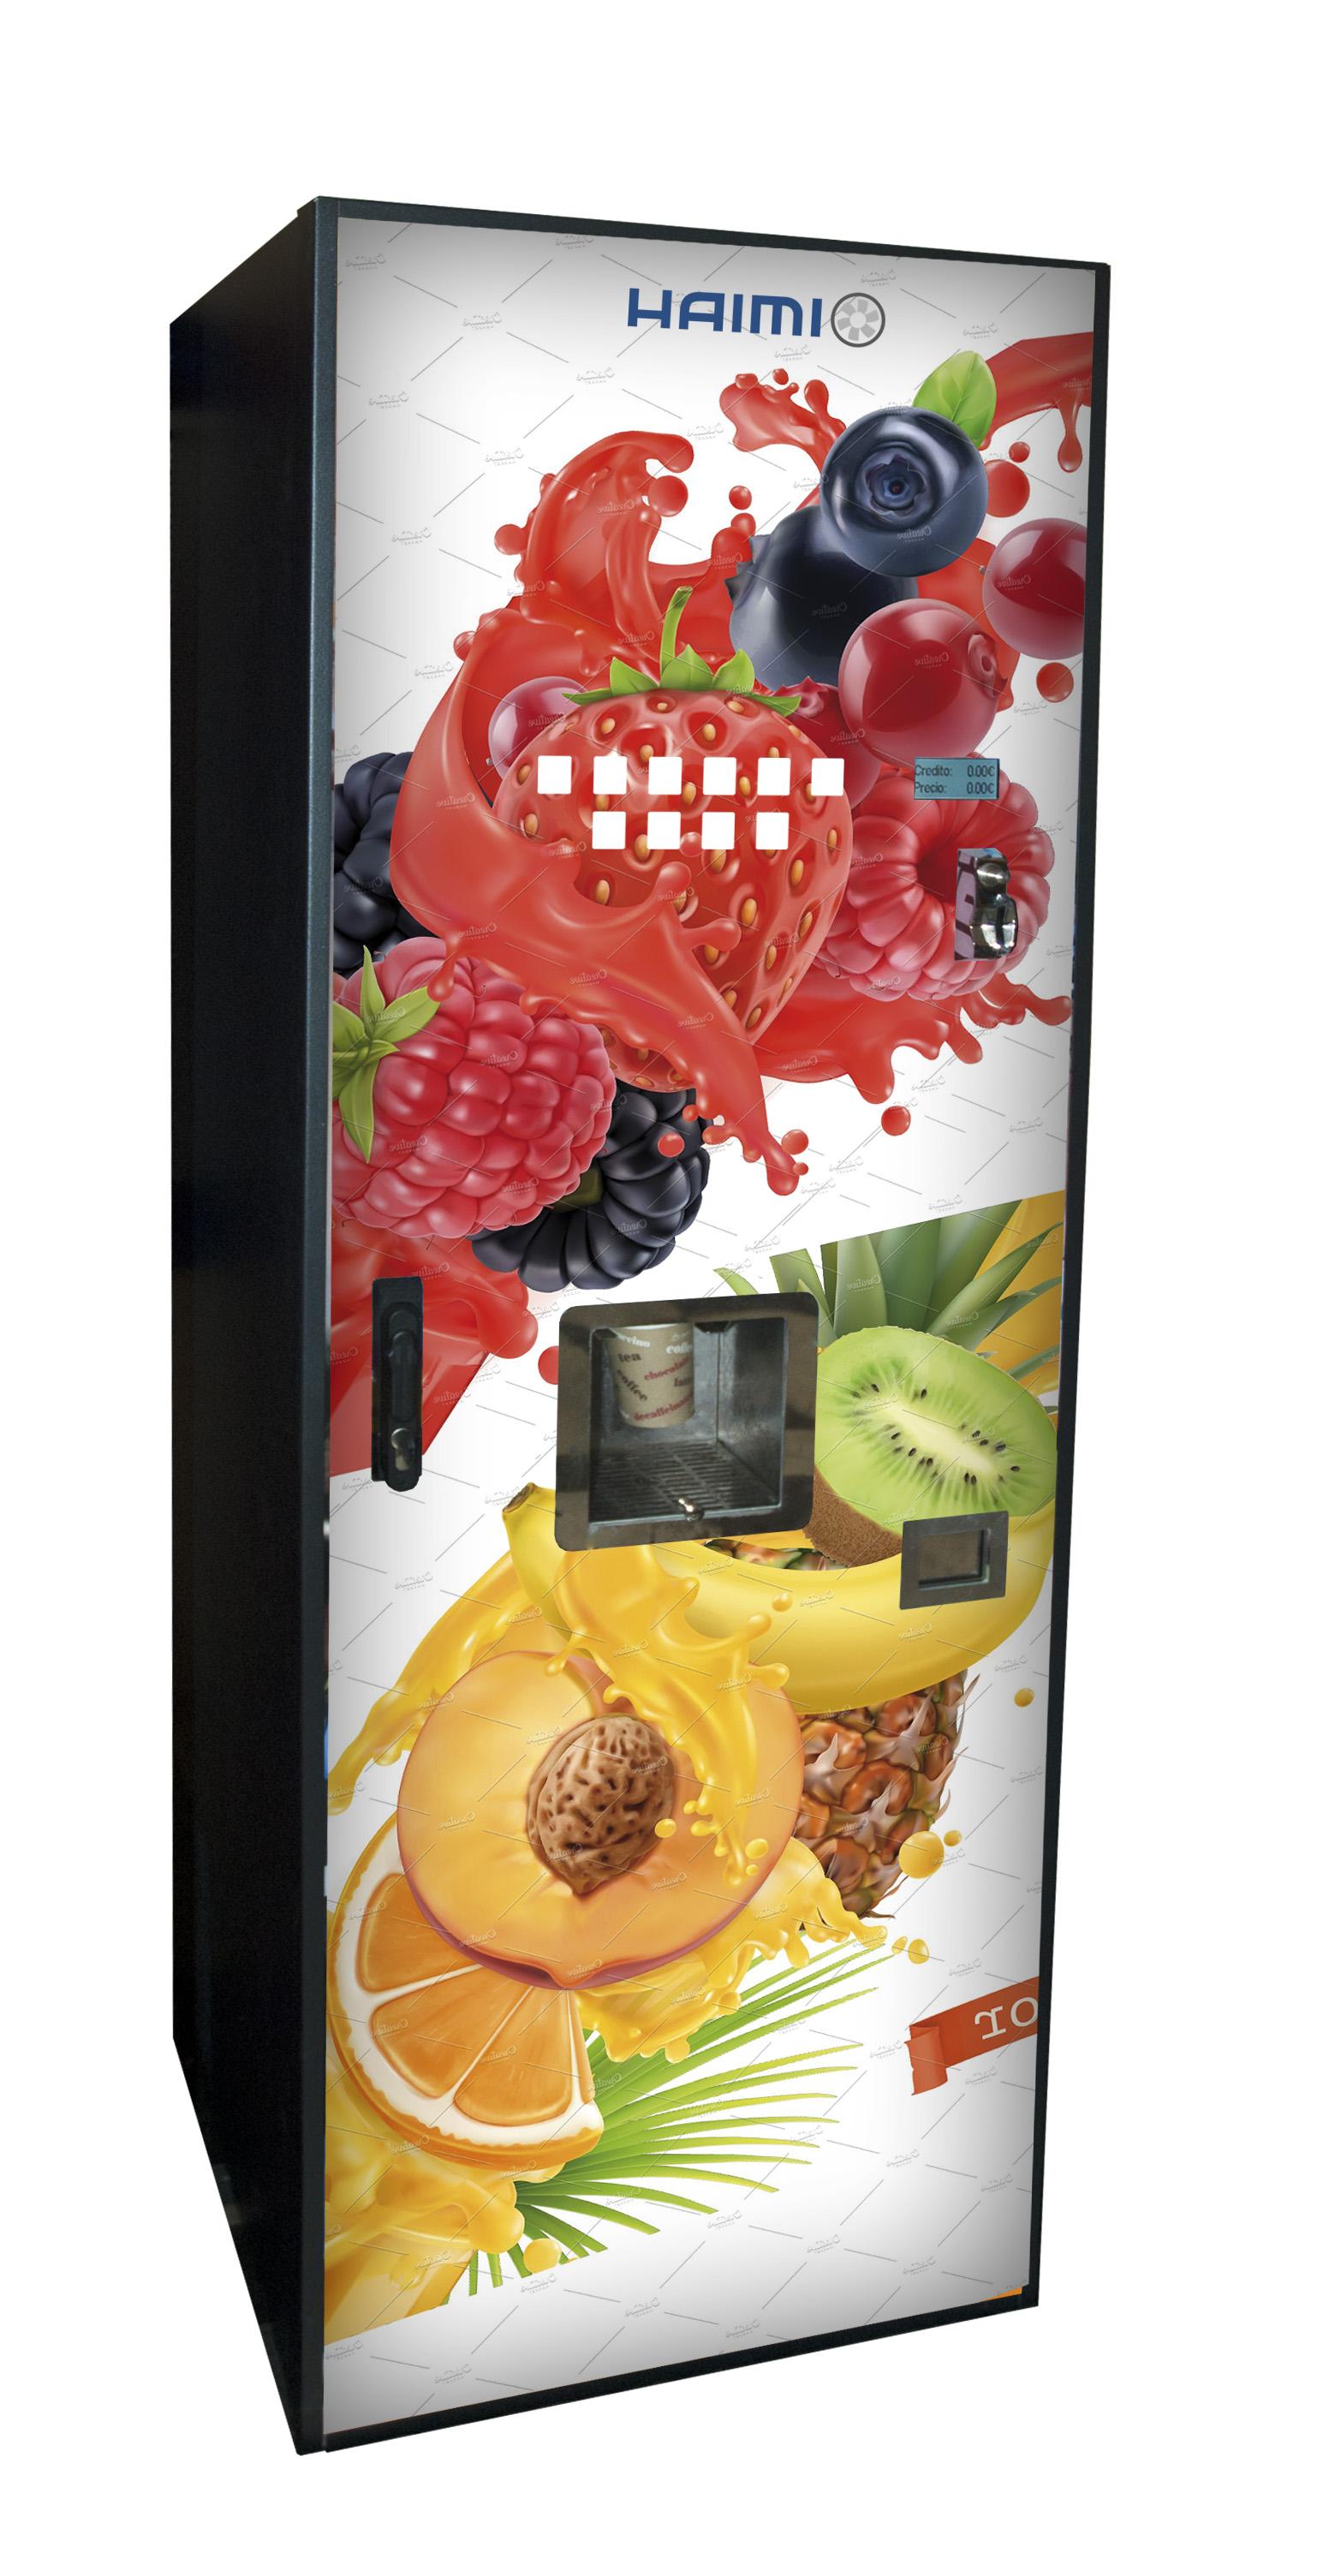 Post mix, juice vending machine and drinks dispenser